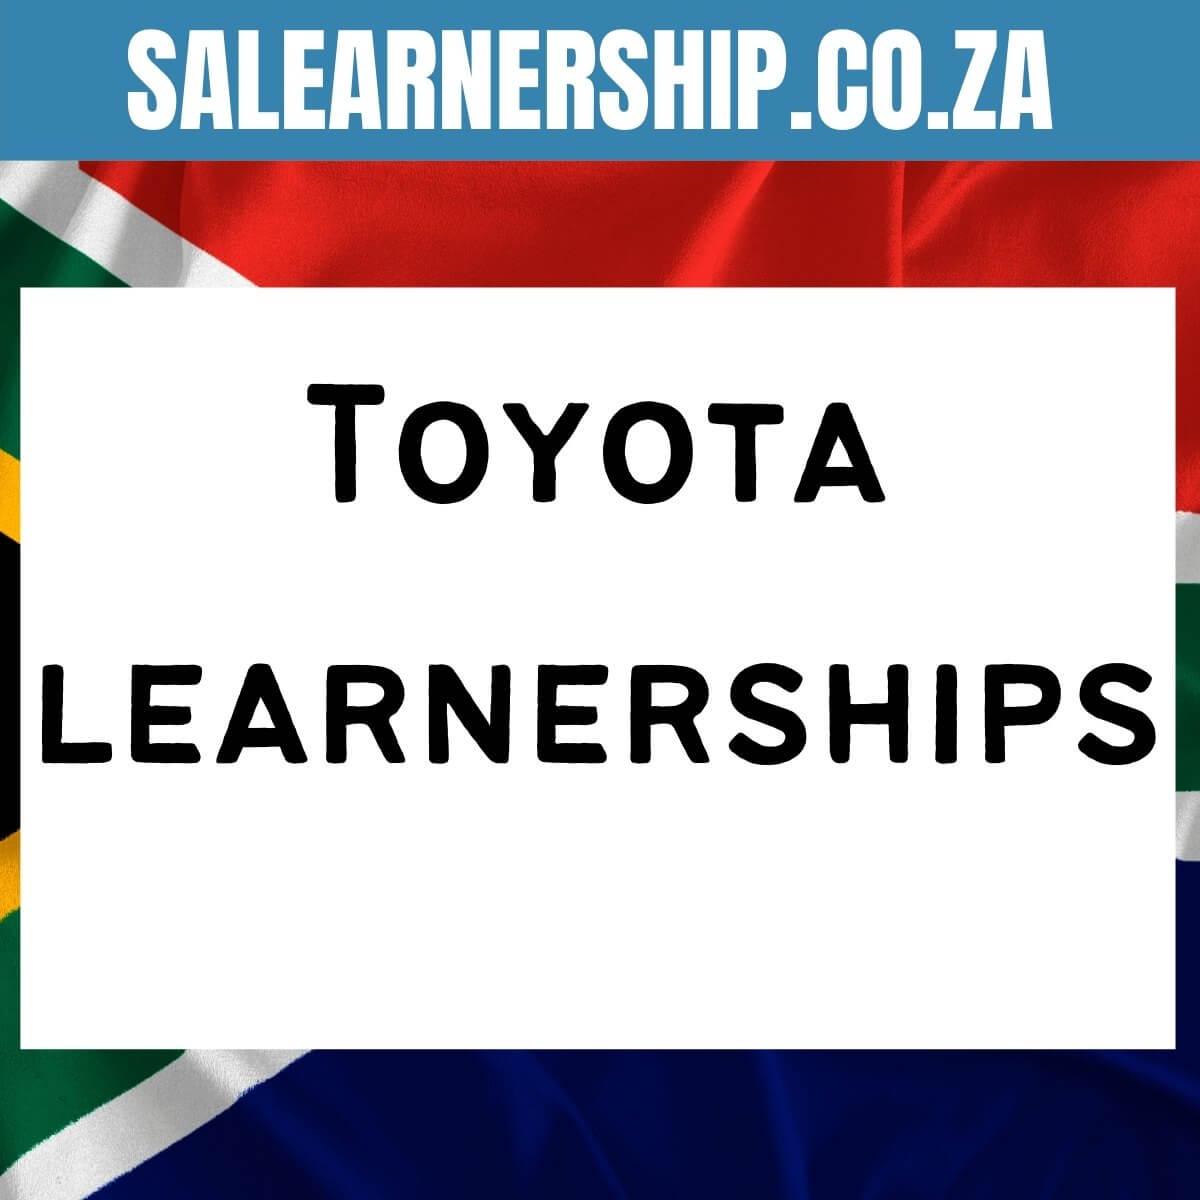 Toyota learnerships